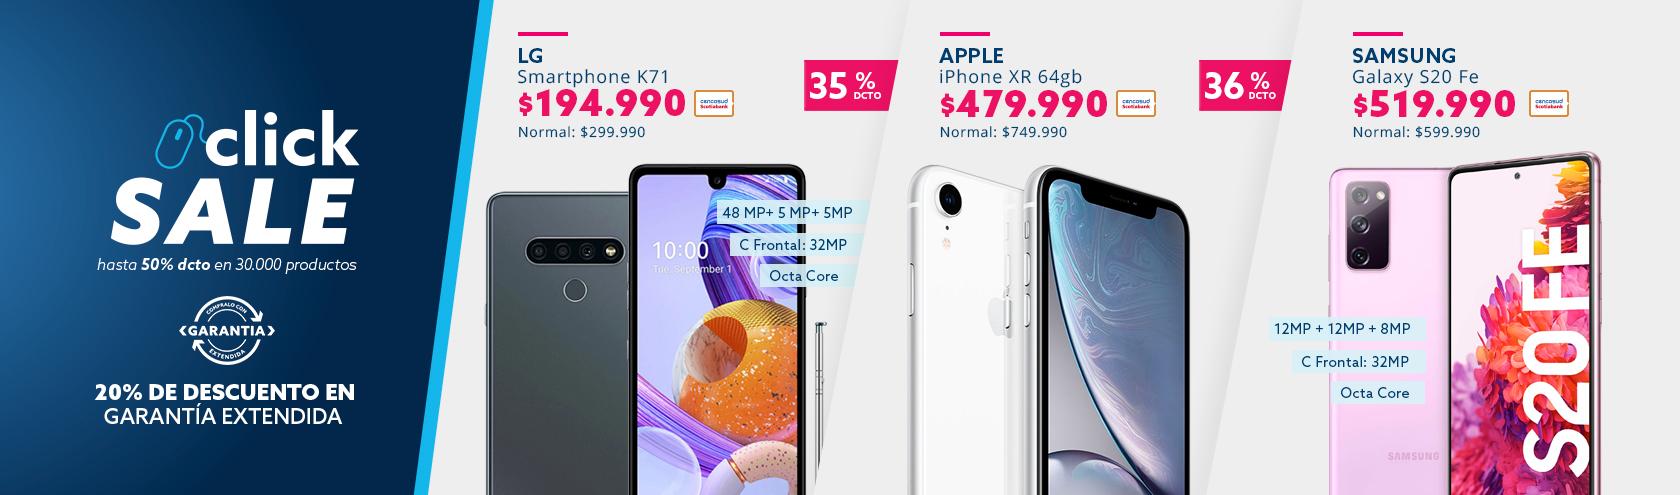 Ofertas en celulares grandes marcas